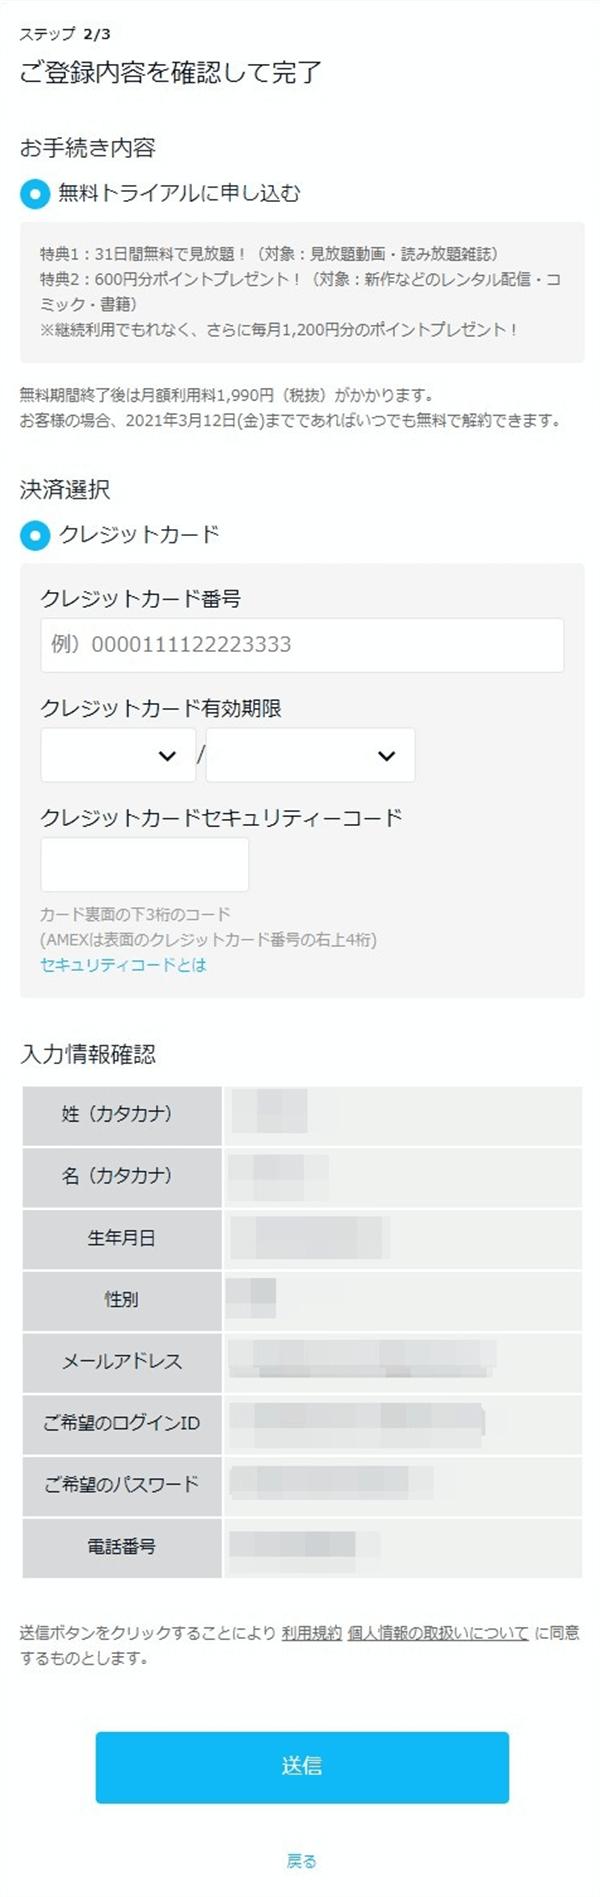 U-NEXT無料トライアルご登録内容確認